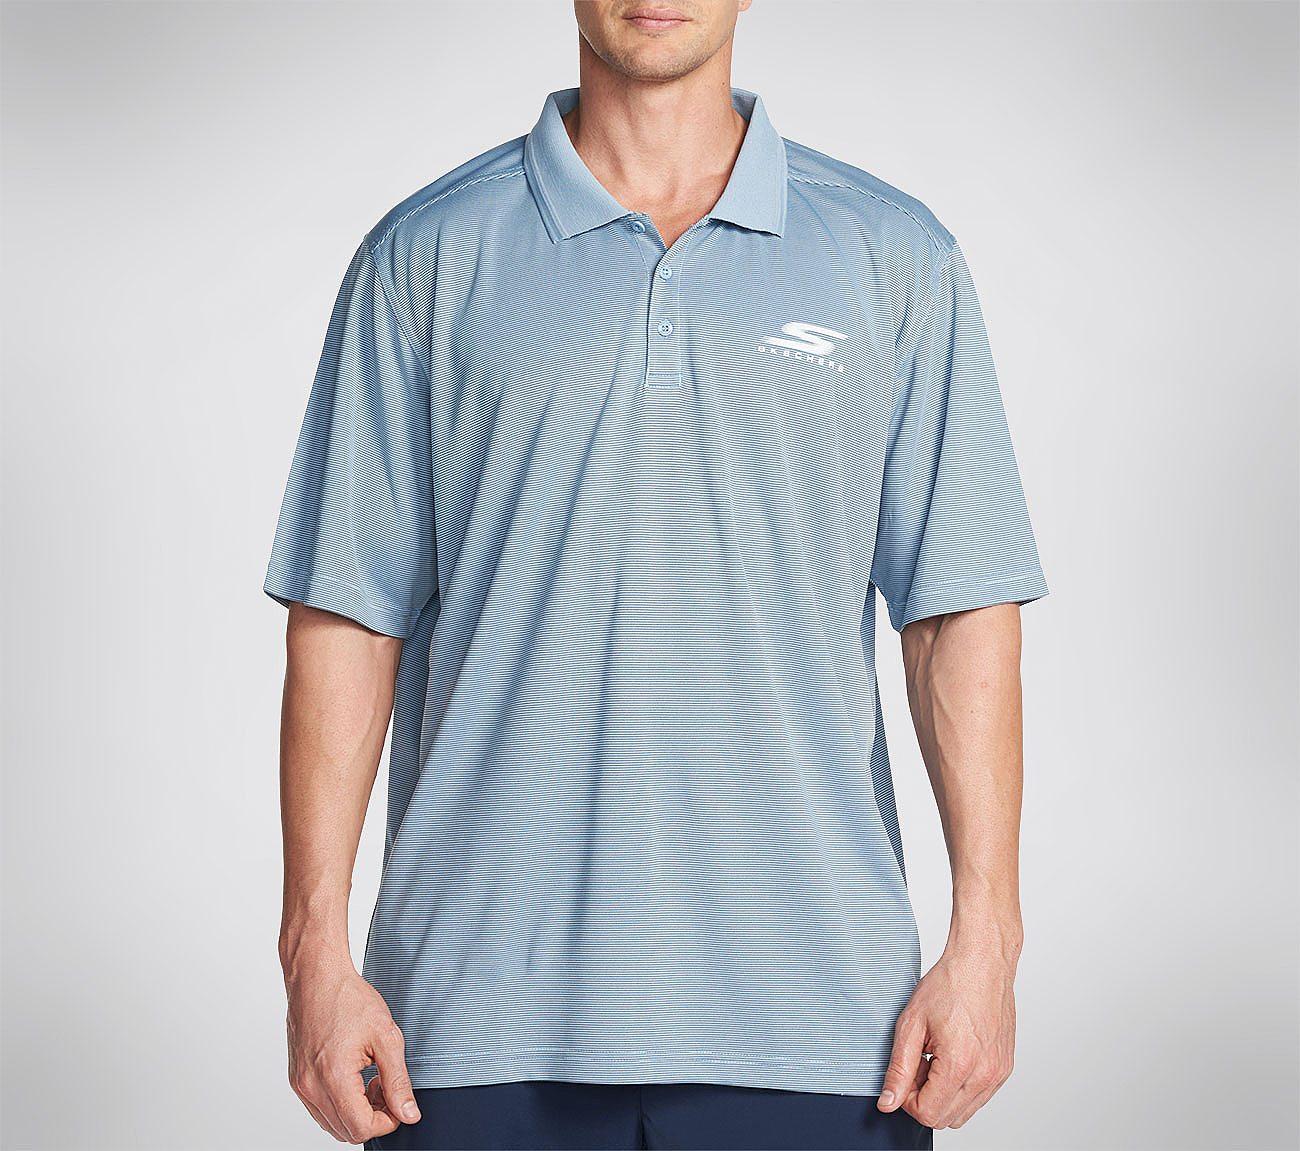 Skechers GO GOLF Eagle Polo Shirt